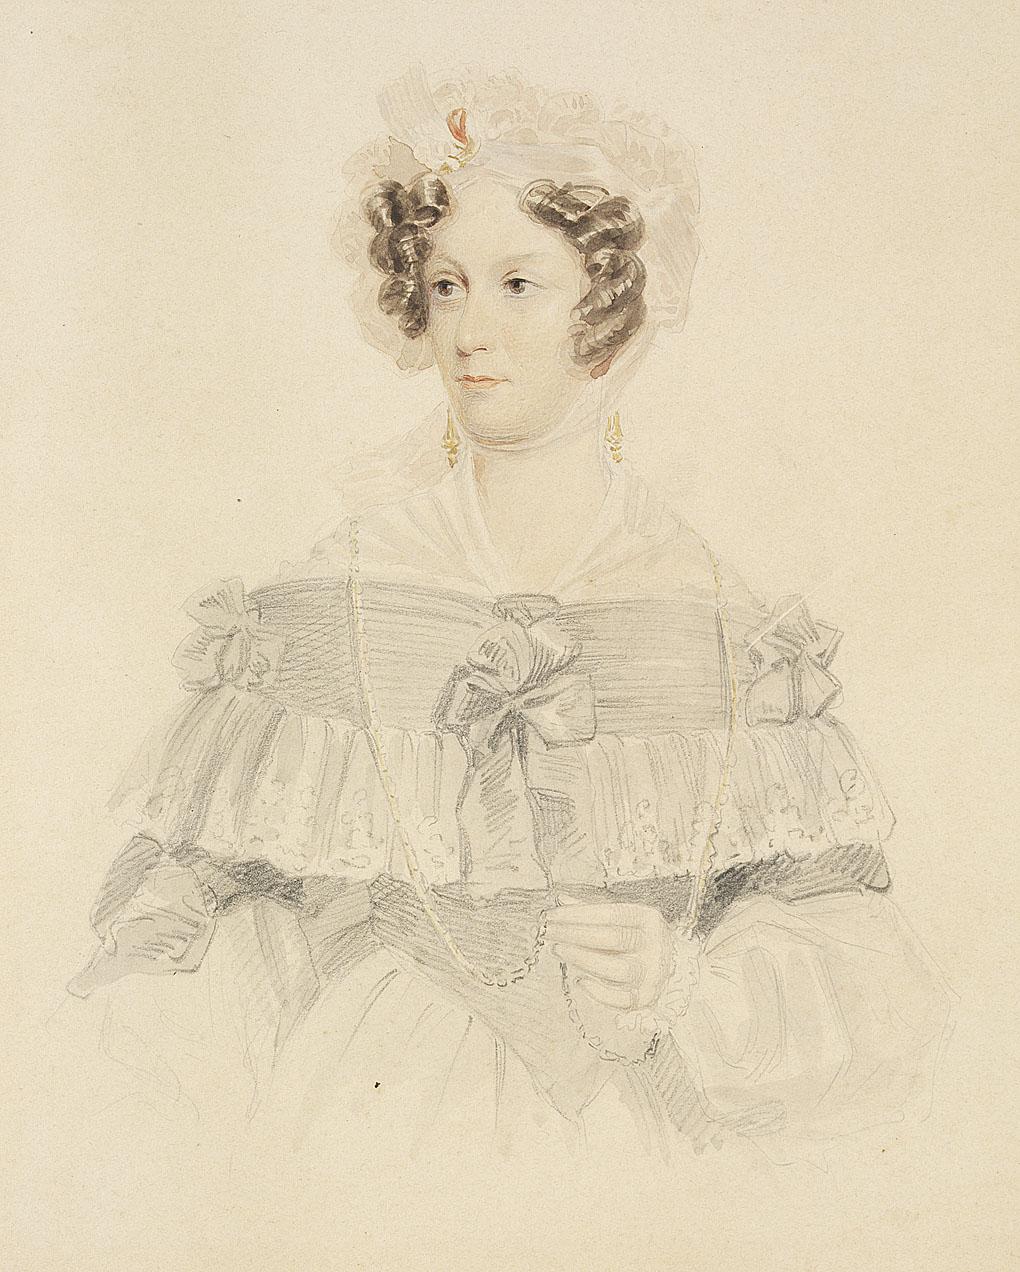 Sketch portrait of a colonial-era woman.